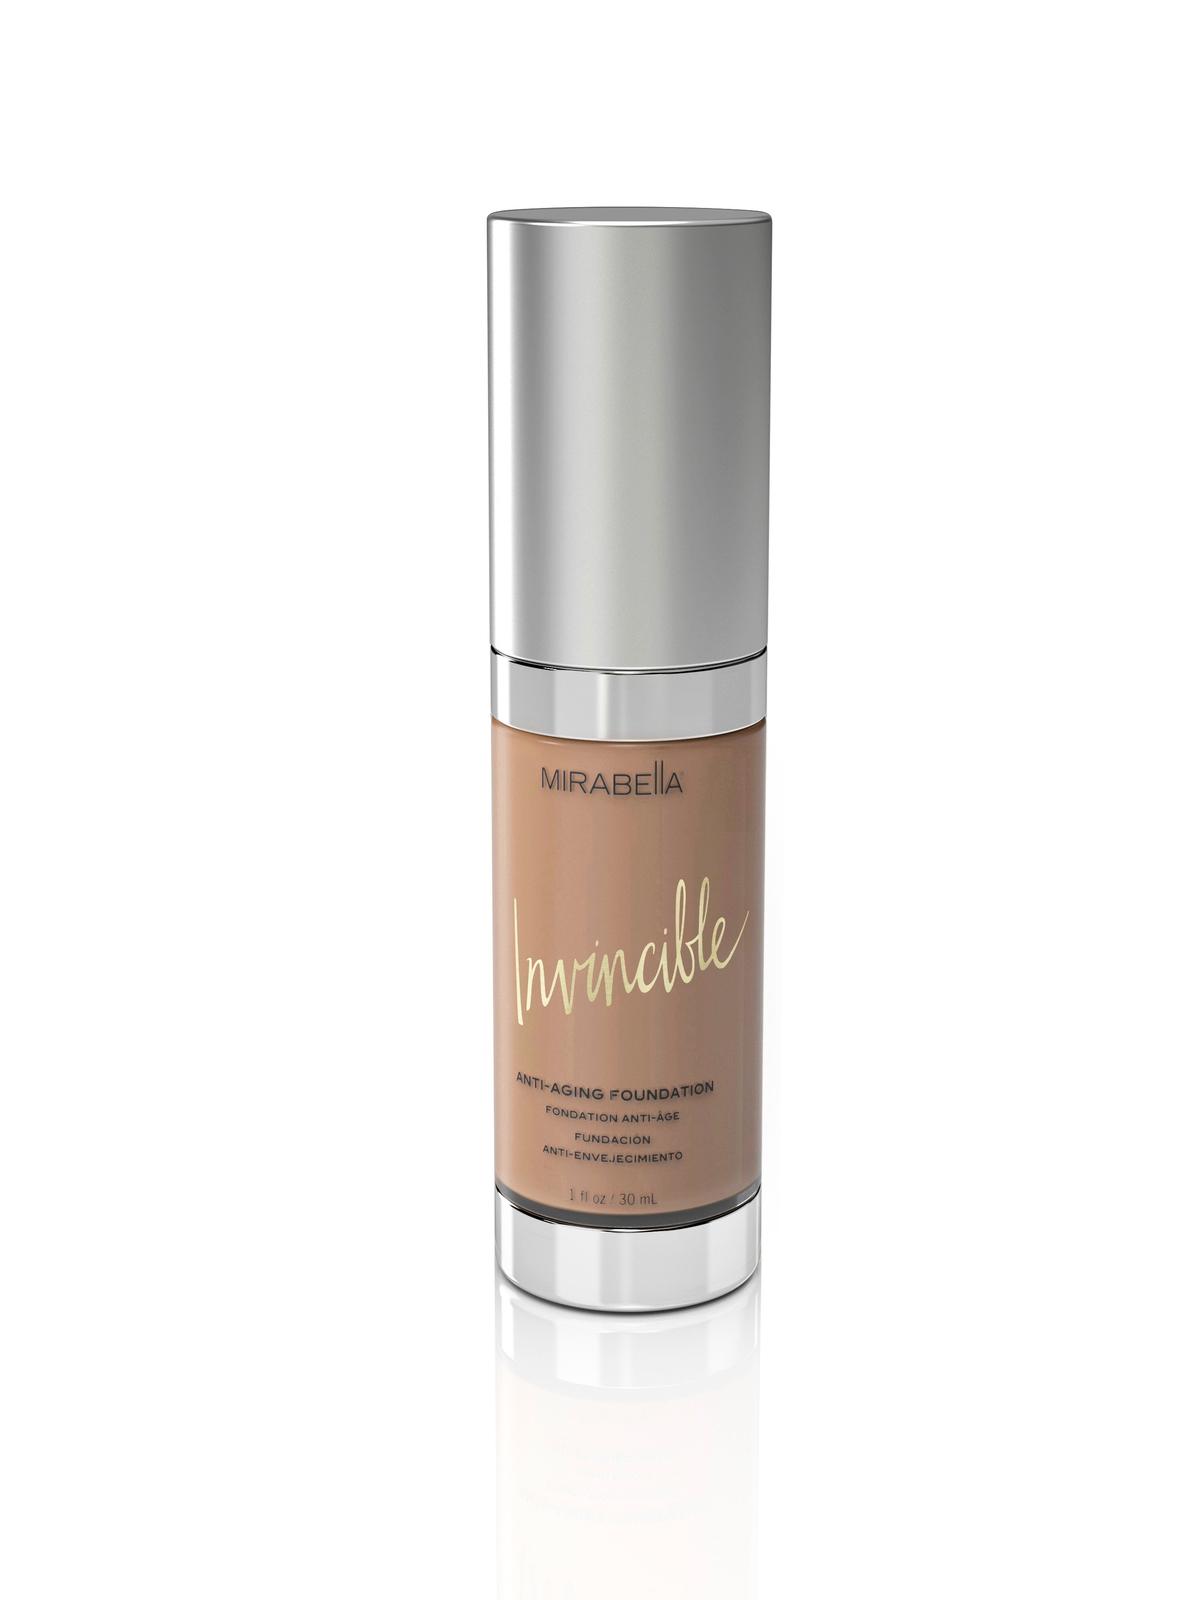 Mirabella Invincible Anti-Aging HD Foundation 1 oz - IV (Medium) - $49.99